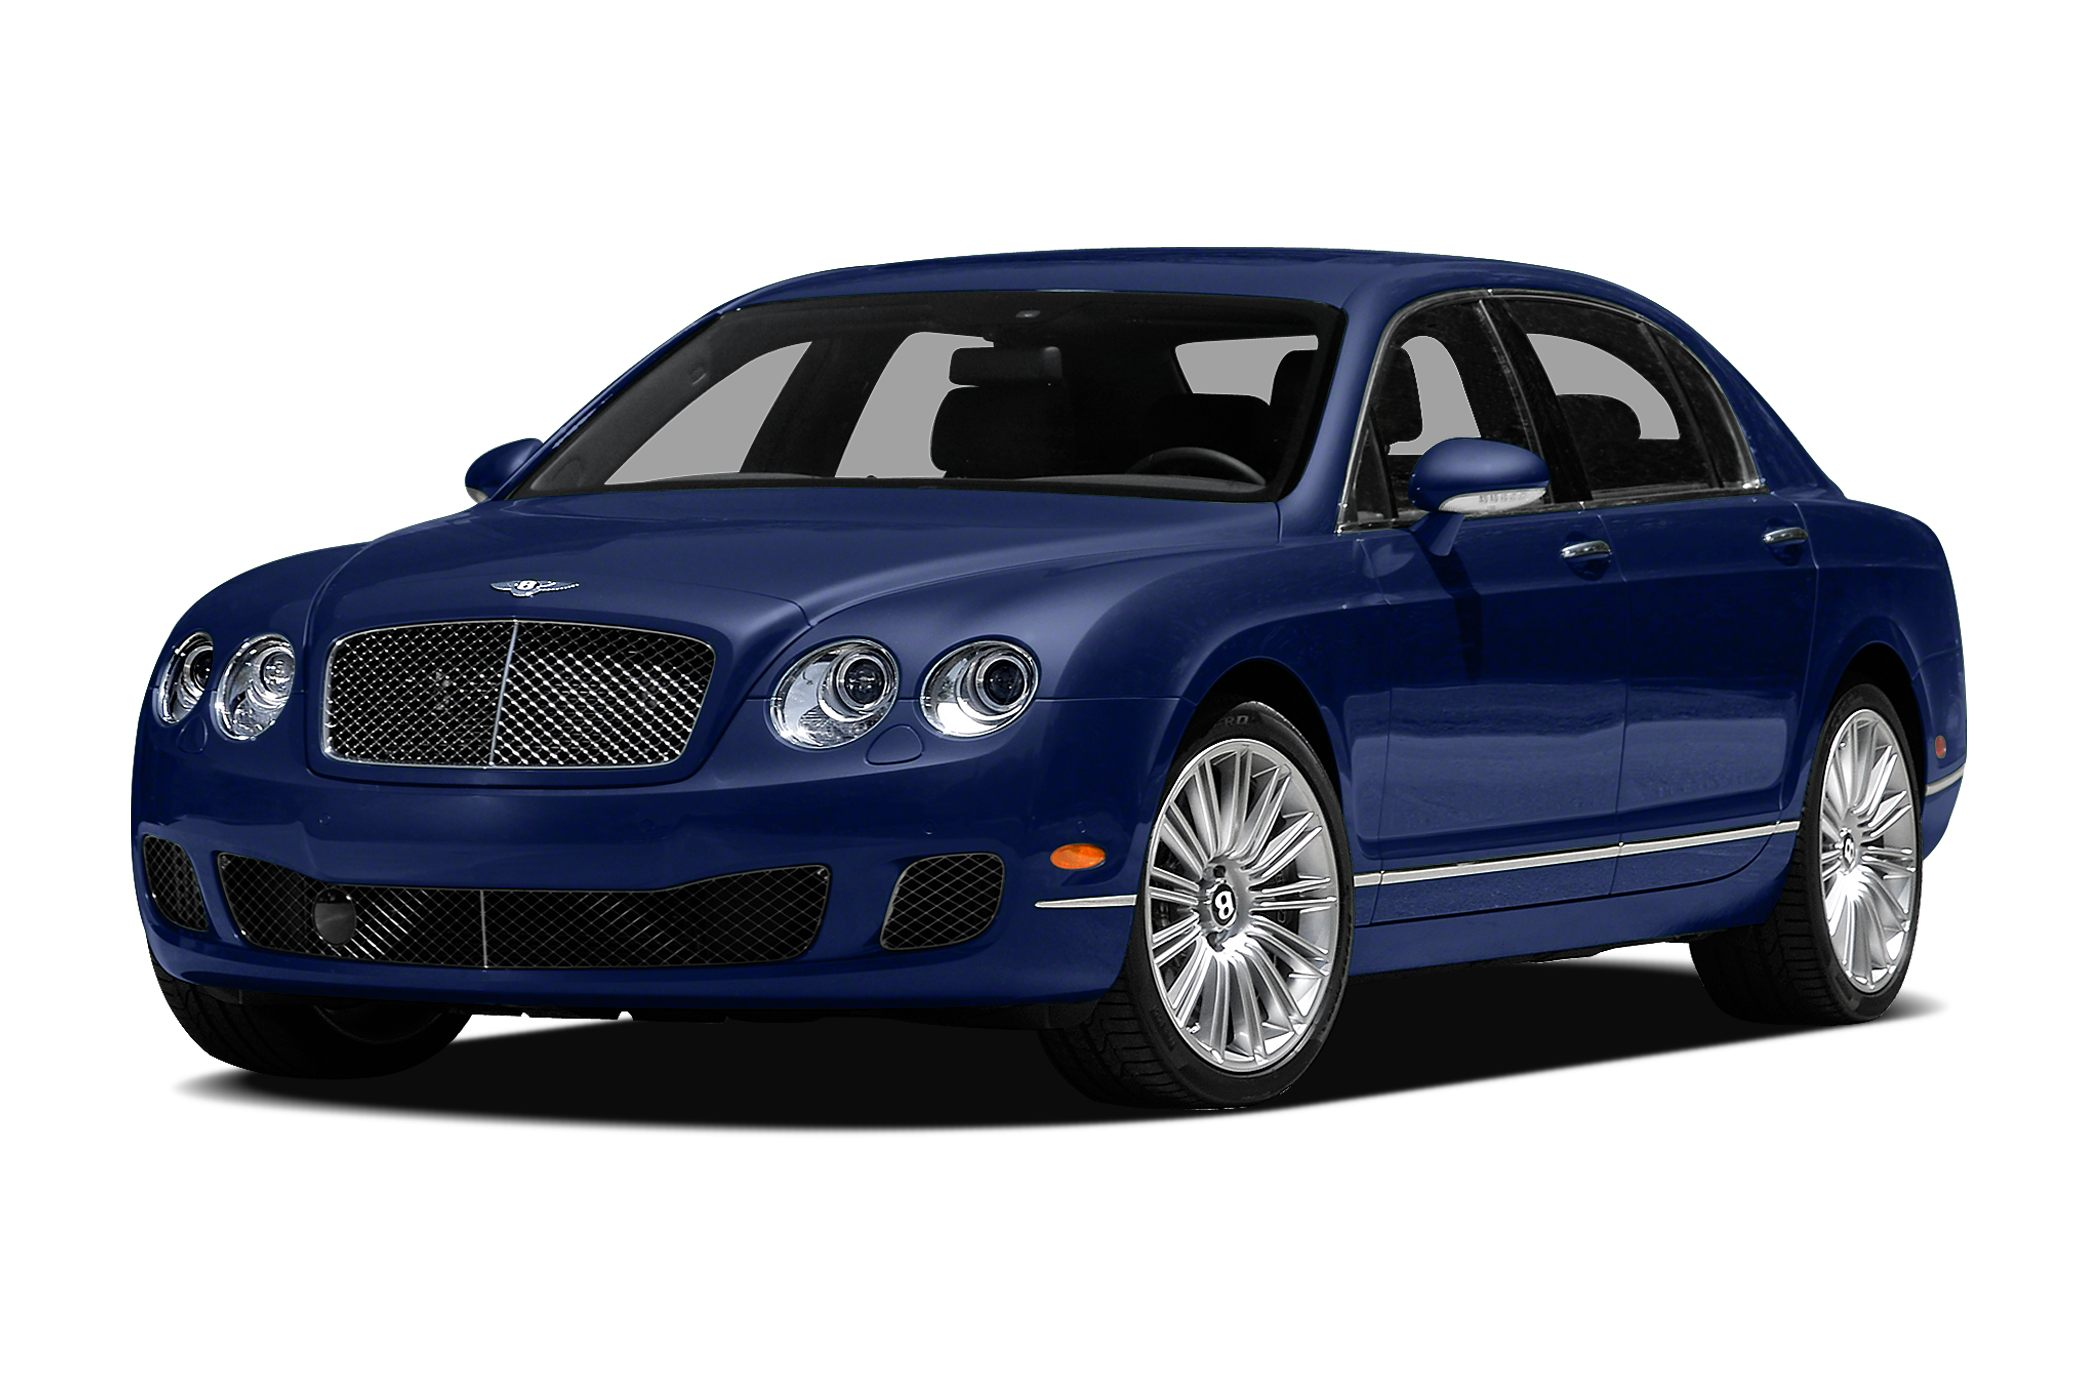 2009 Bentley Continental Flying Spur Speed Sedan for Sale